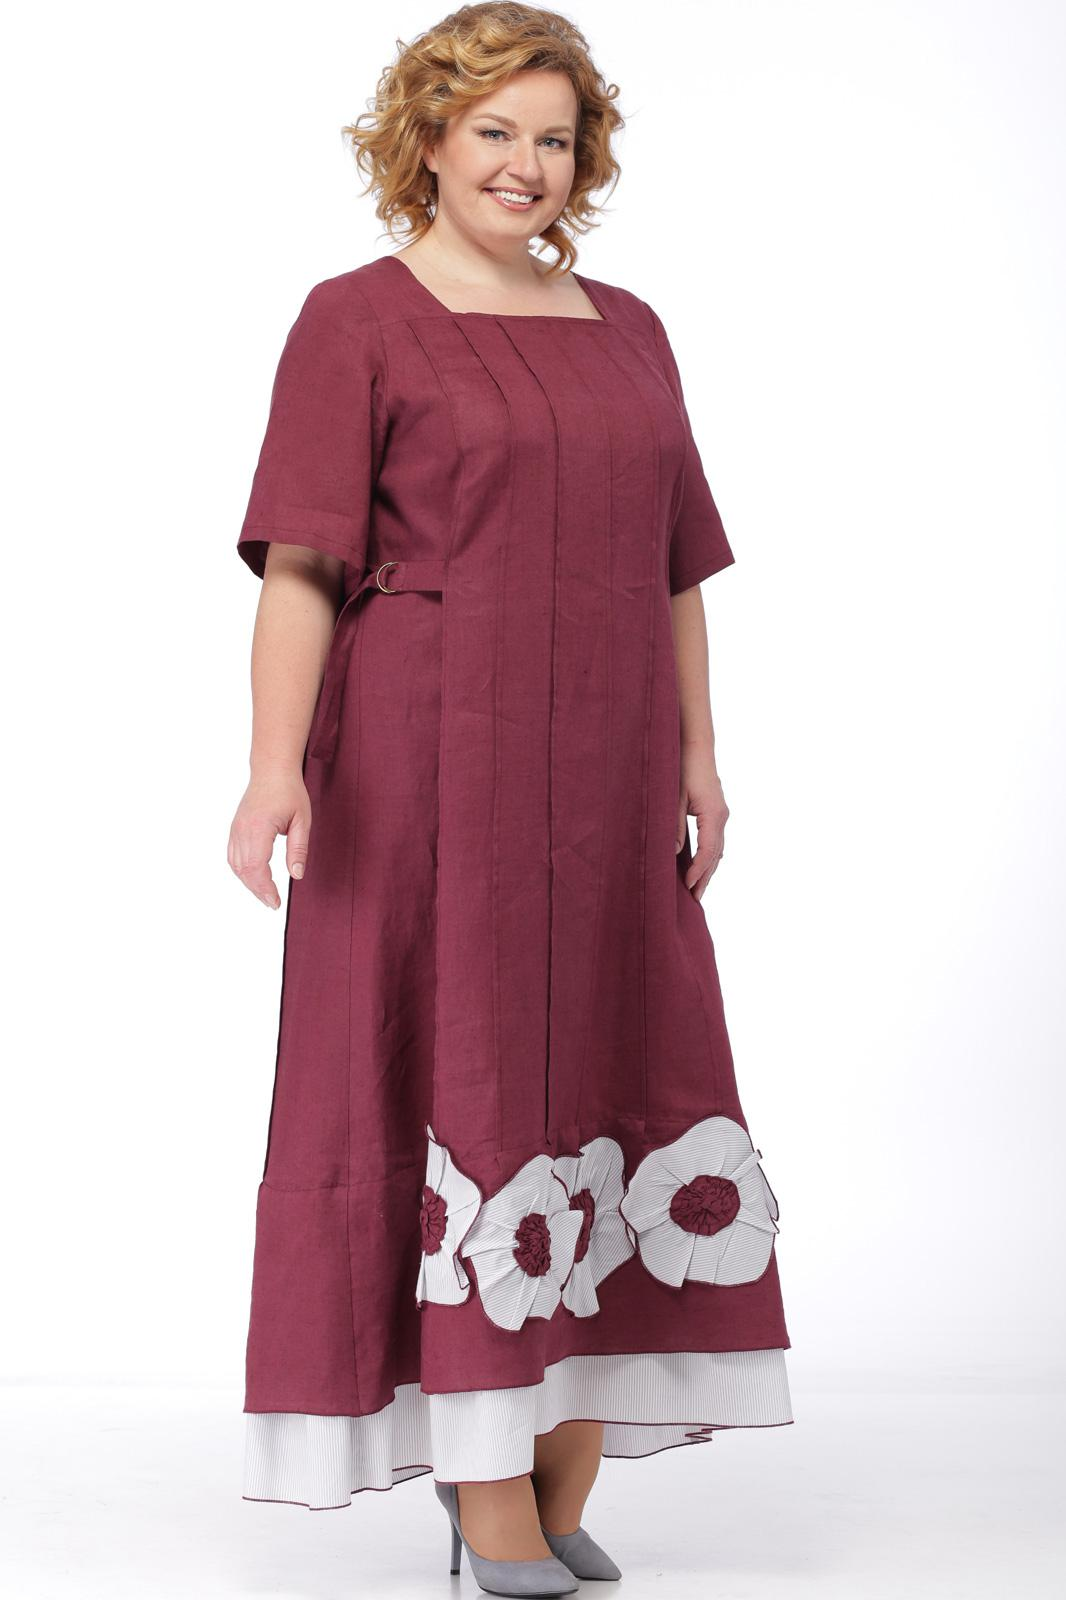 Купить Платье Michel Chic, 698 бордо, Беларусь